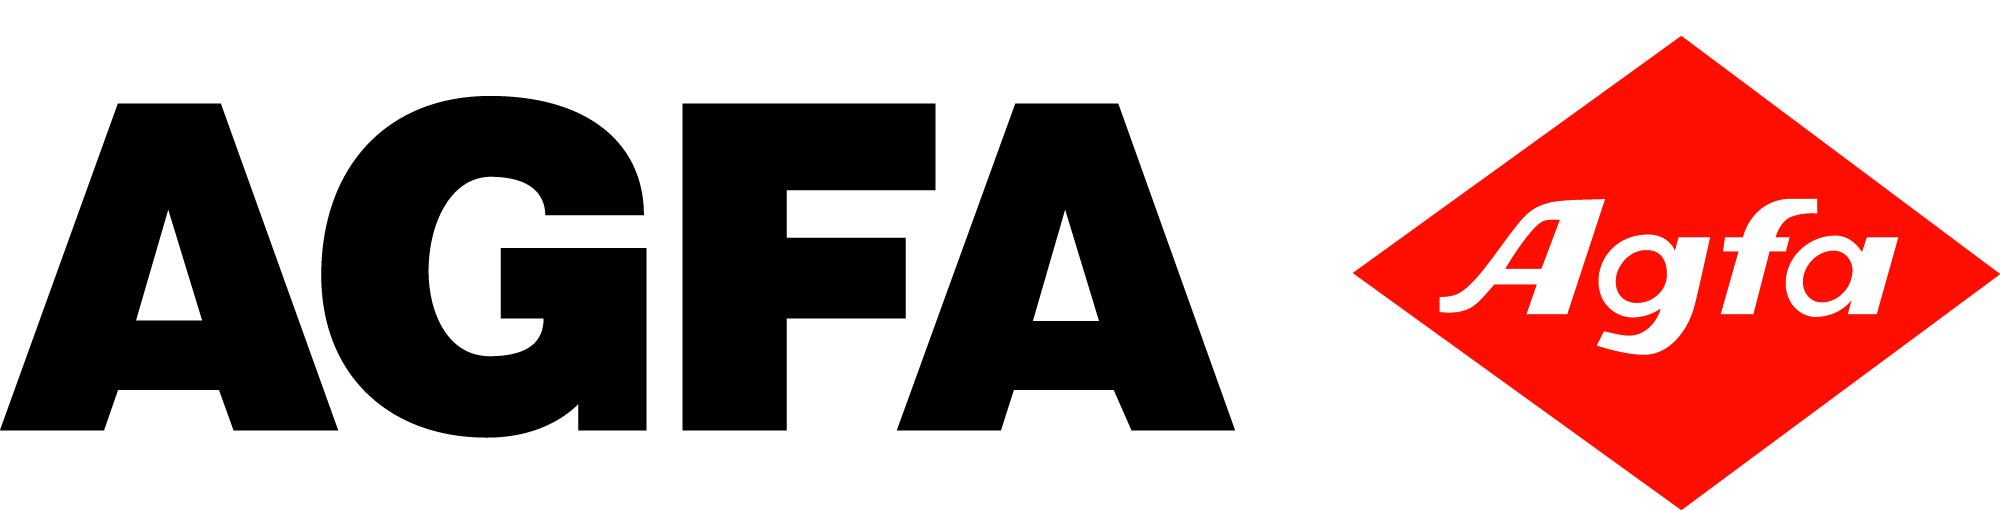 Agfa_logo_color